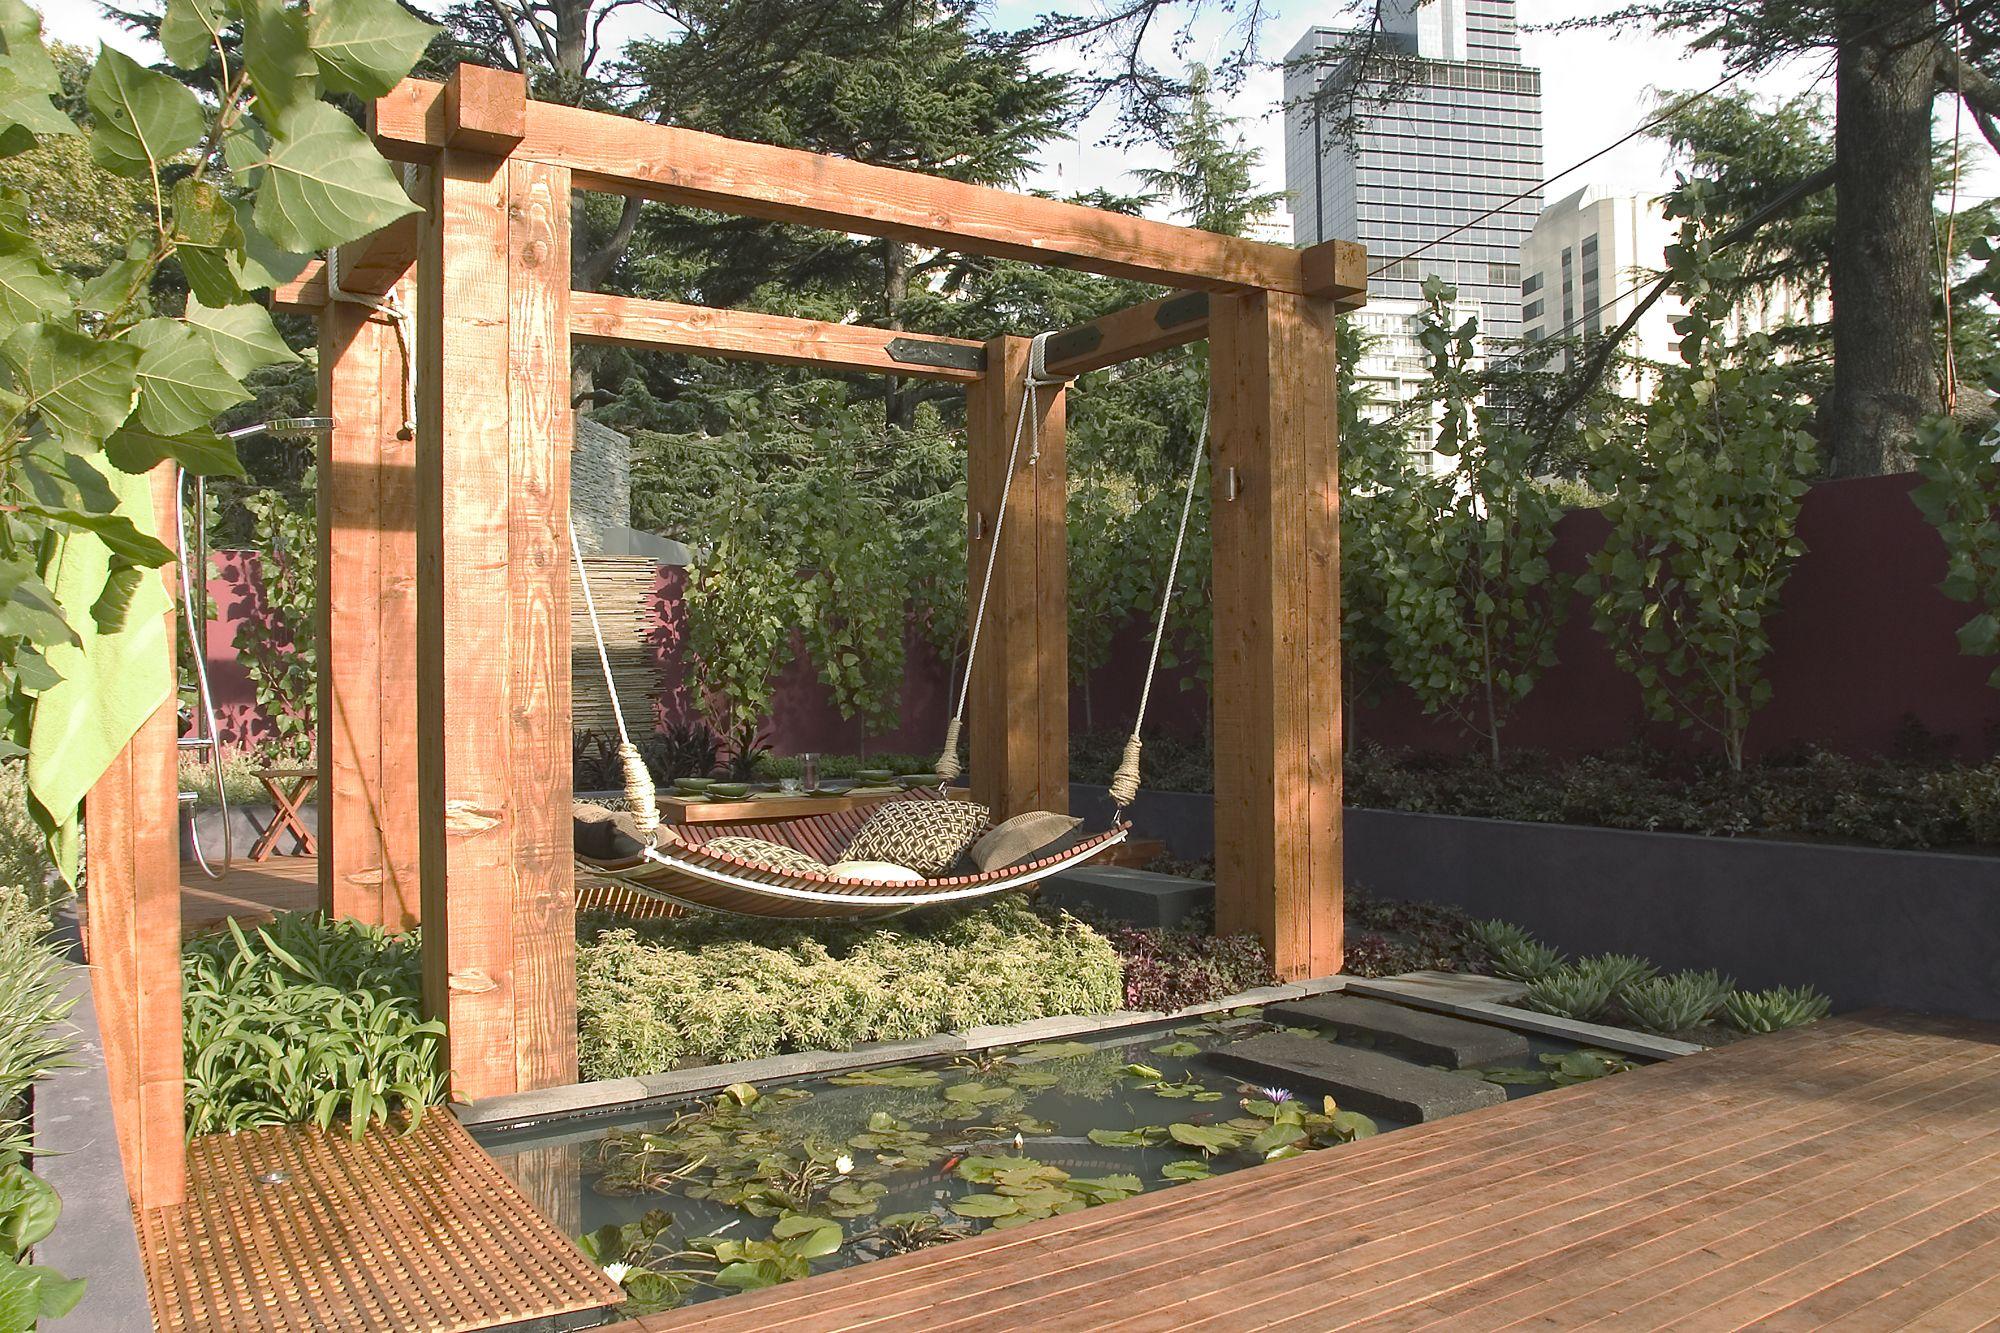 Jamie Durie garden hammock bed design! Garden hammock